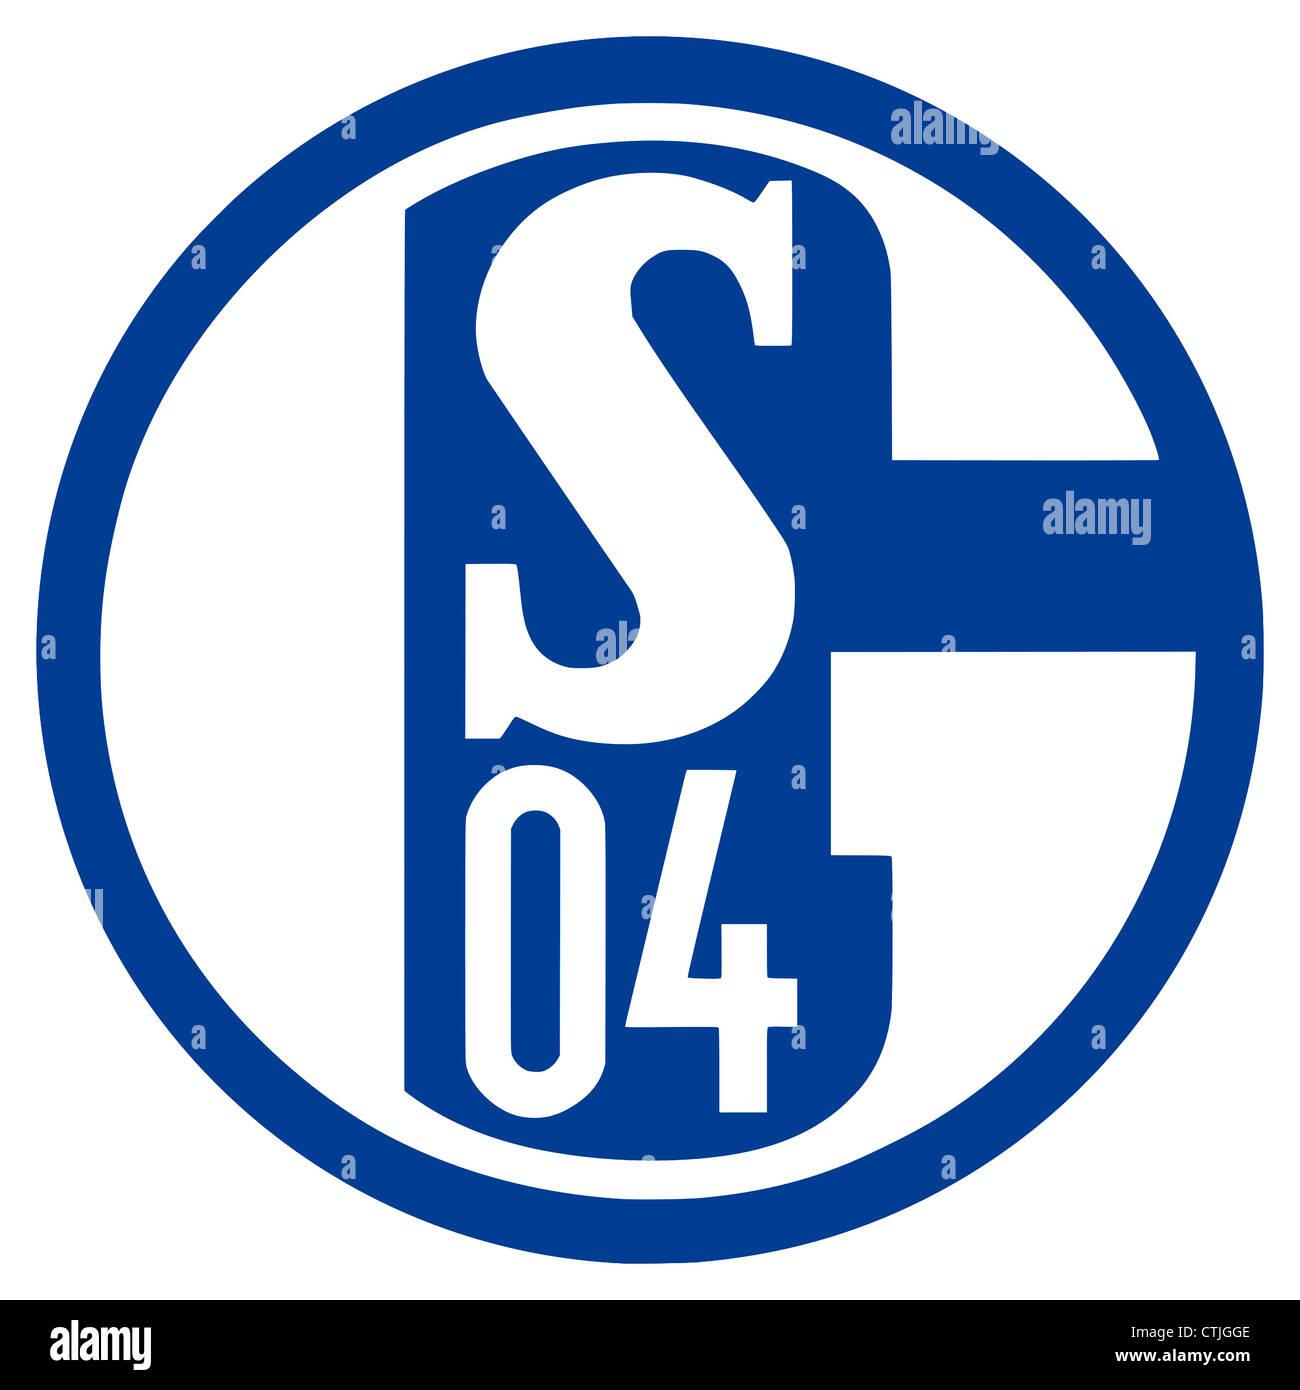 Logo of German football team FC Schalke 04. - Stock Image